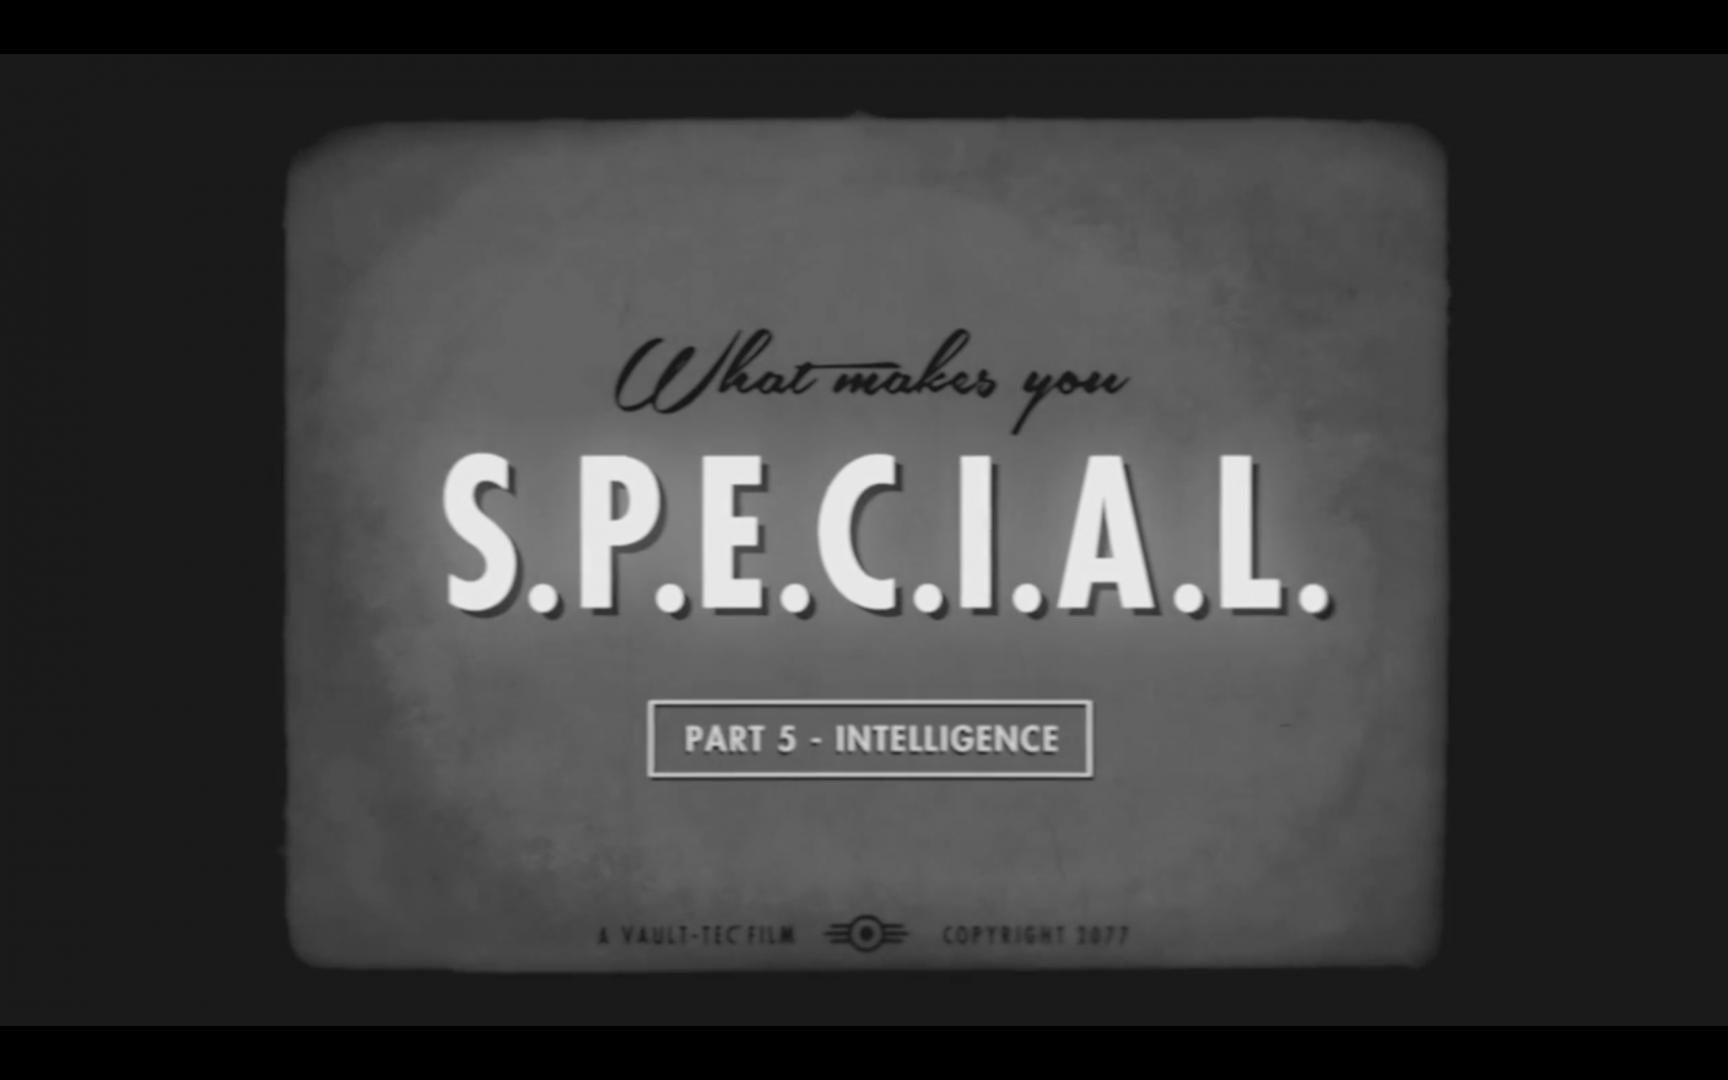 How to be S.P.E.C.I.A.L. and Intelligent in Fallout 4